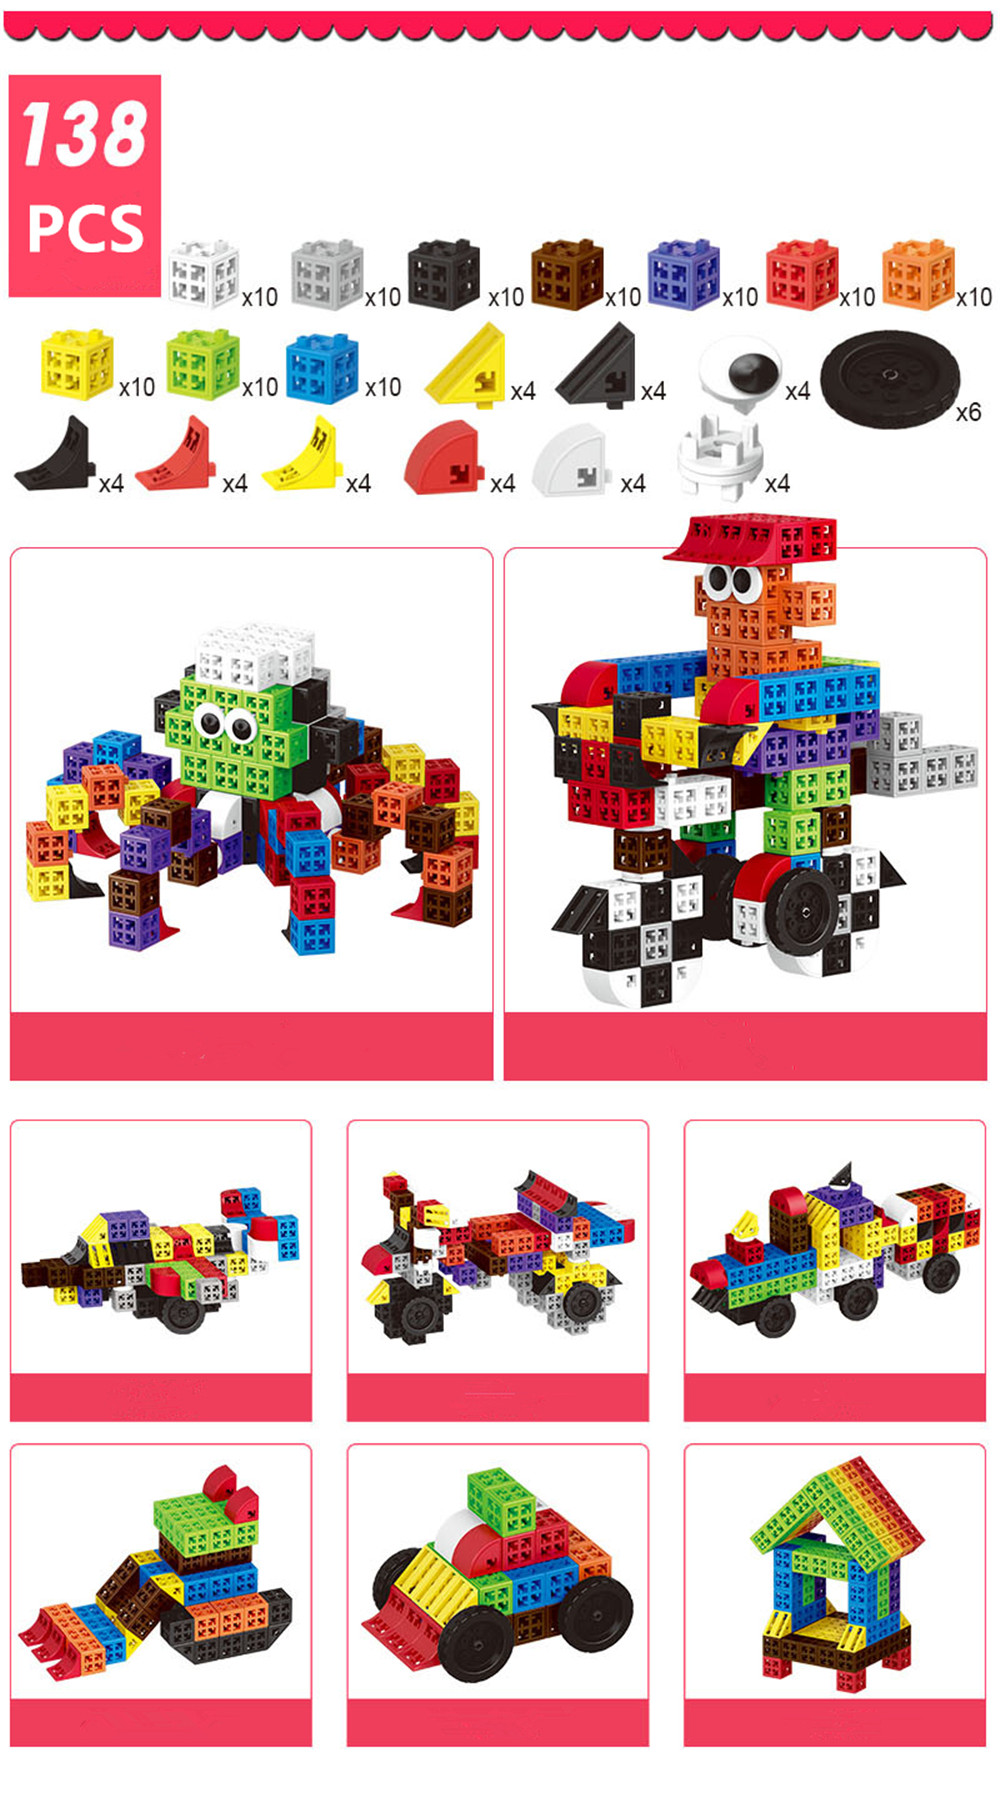 34/48/88/138/188pcs Blocks Cubes Unit Plastic Interlocking Construction Model Building Set of Early Educational Toys For Child 14